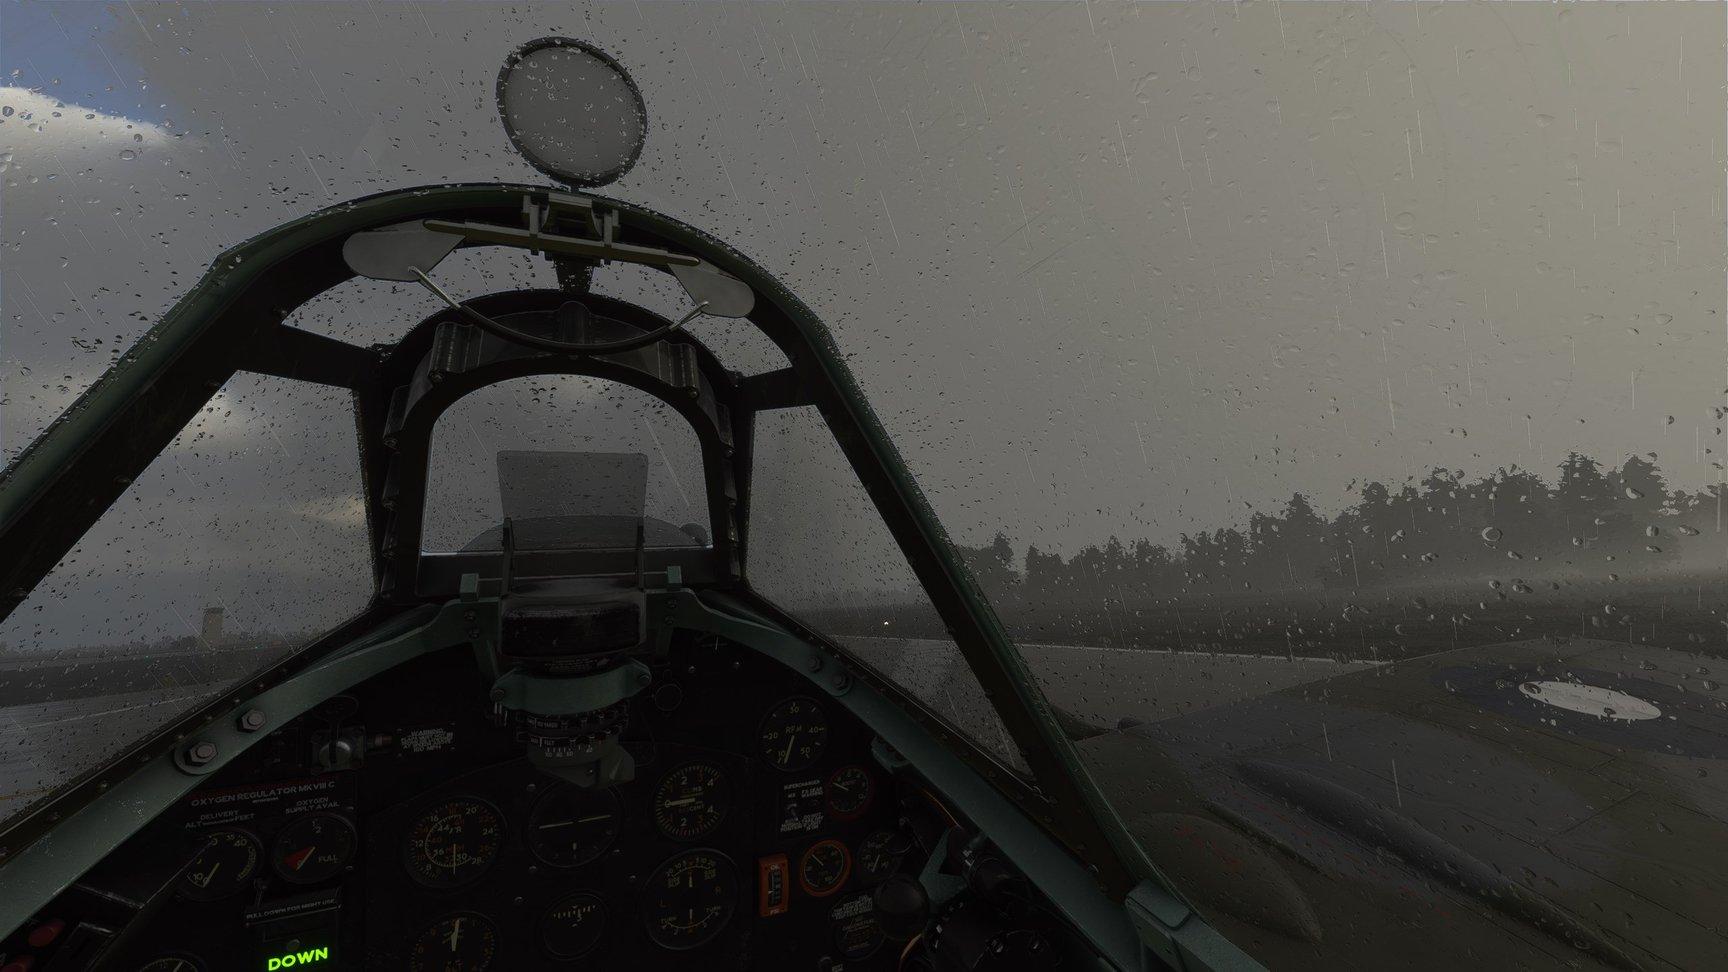 FlightSimulator_P8RmMifz6z_1728x